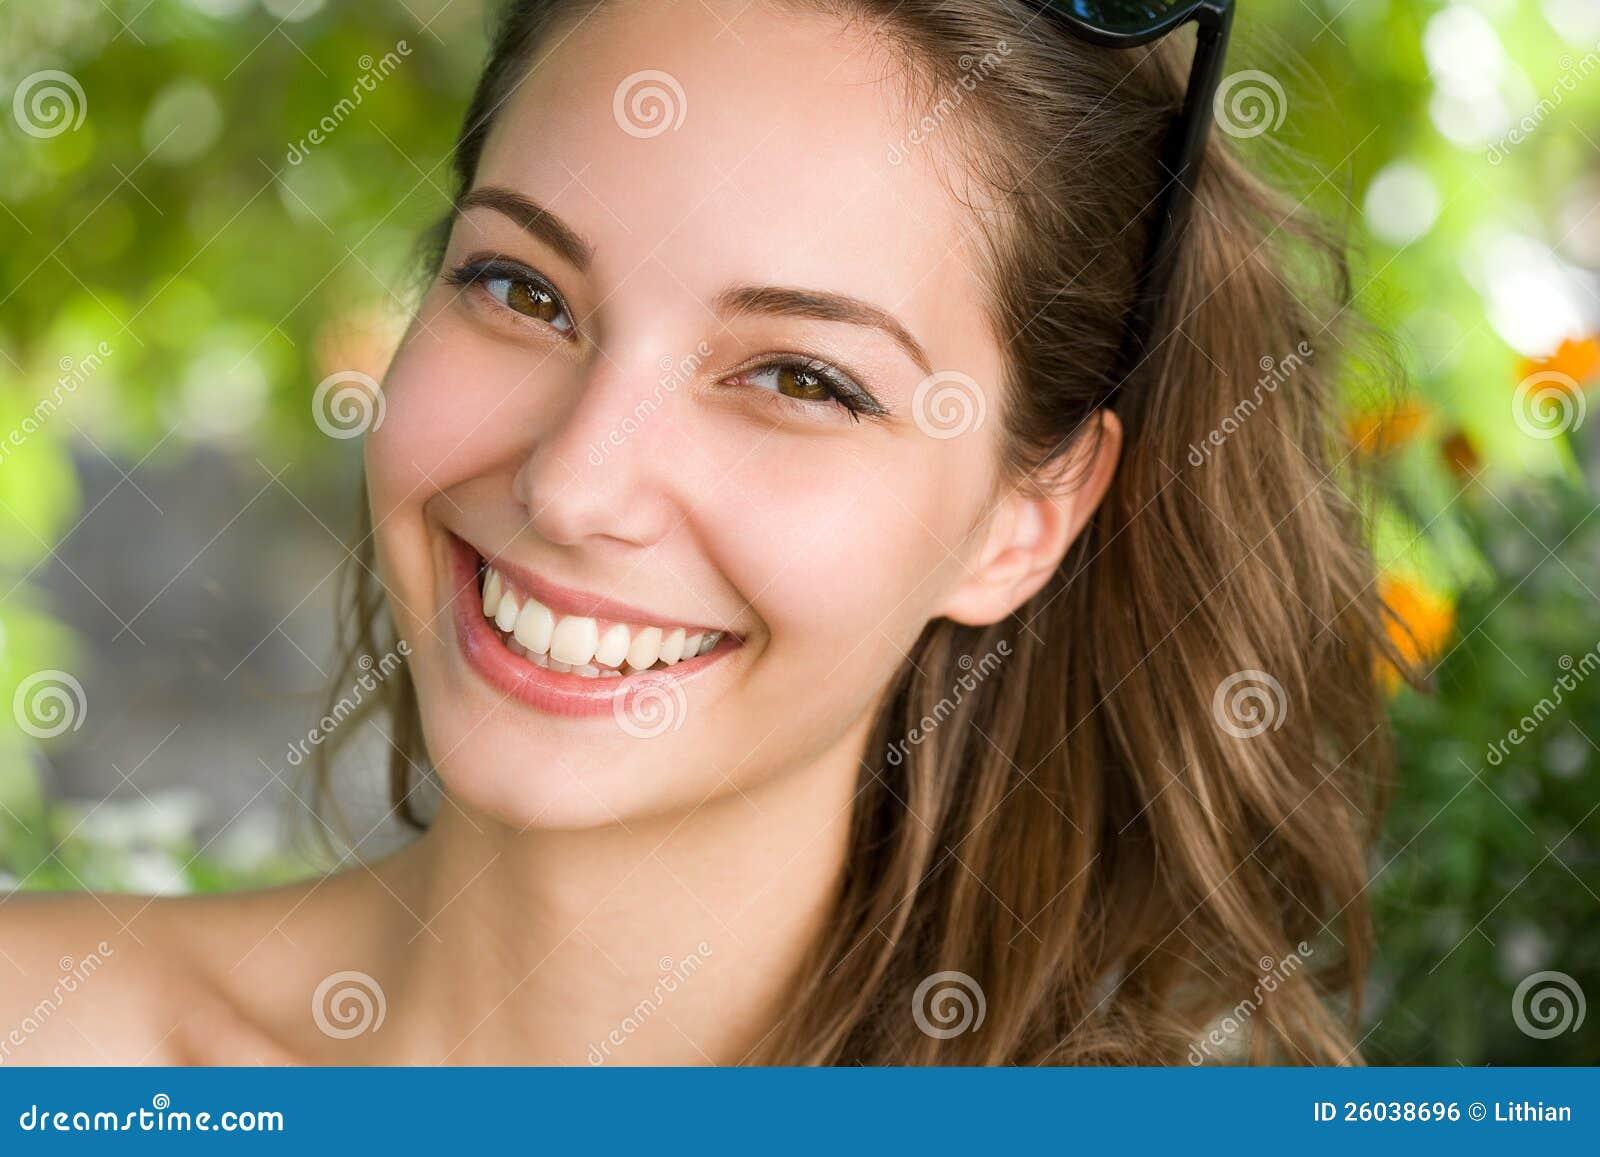 Mulher triguenha nova feliz com sorriso surpreendente.